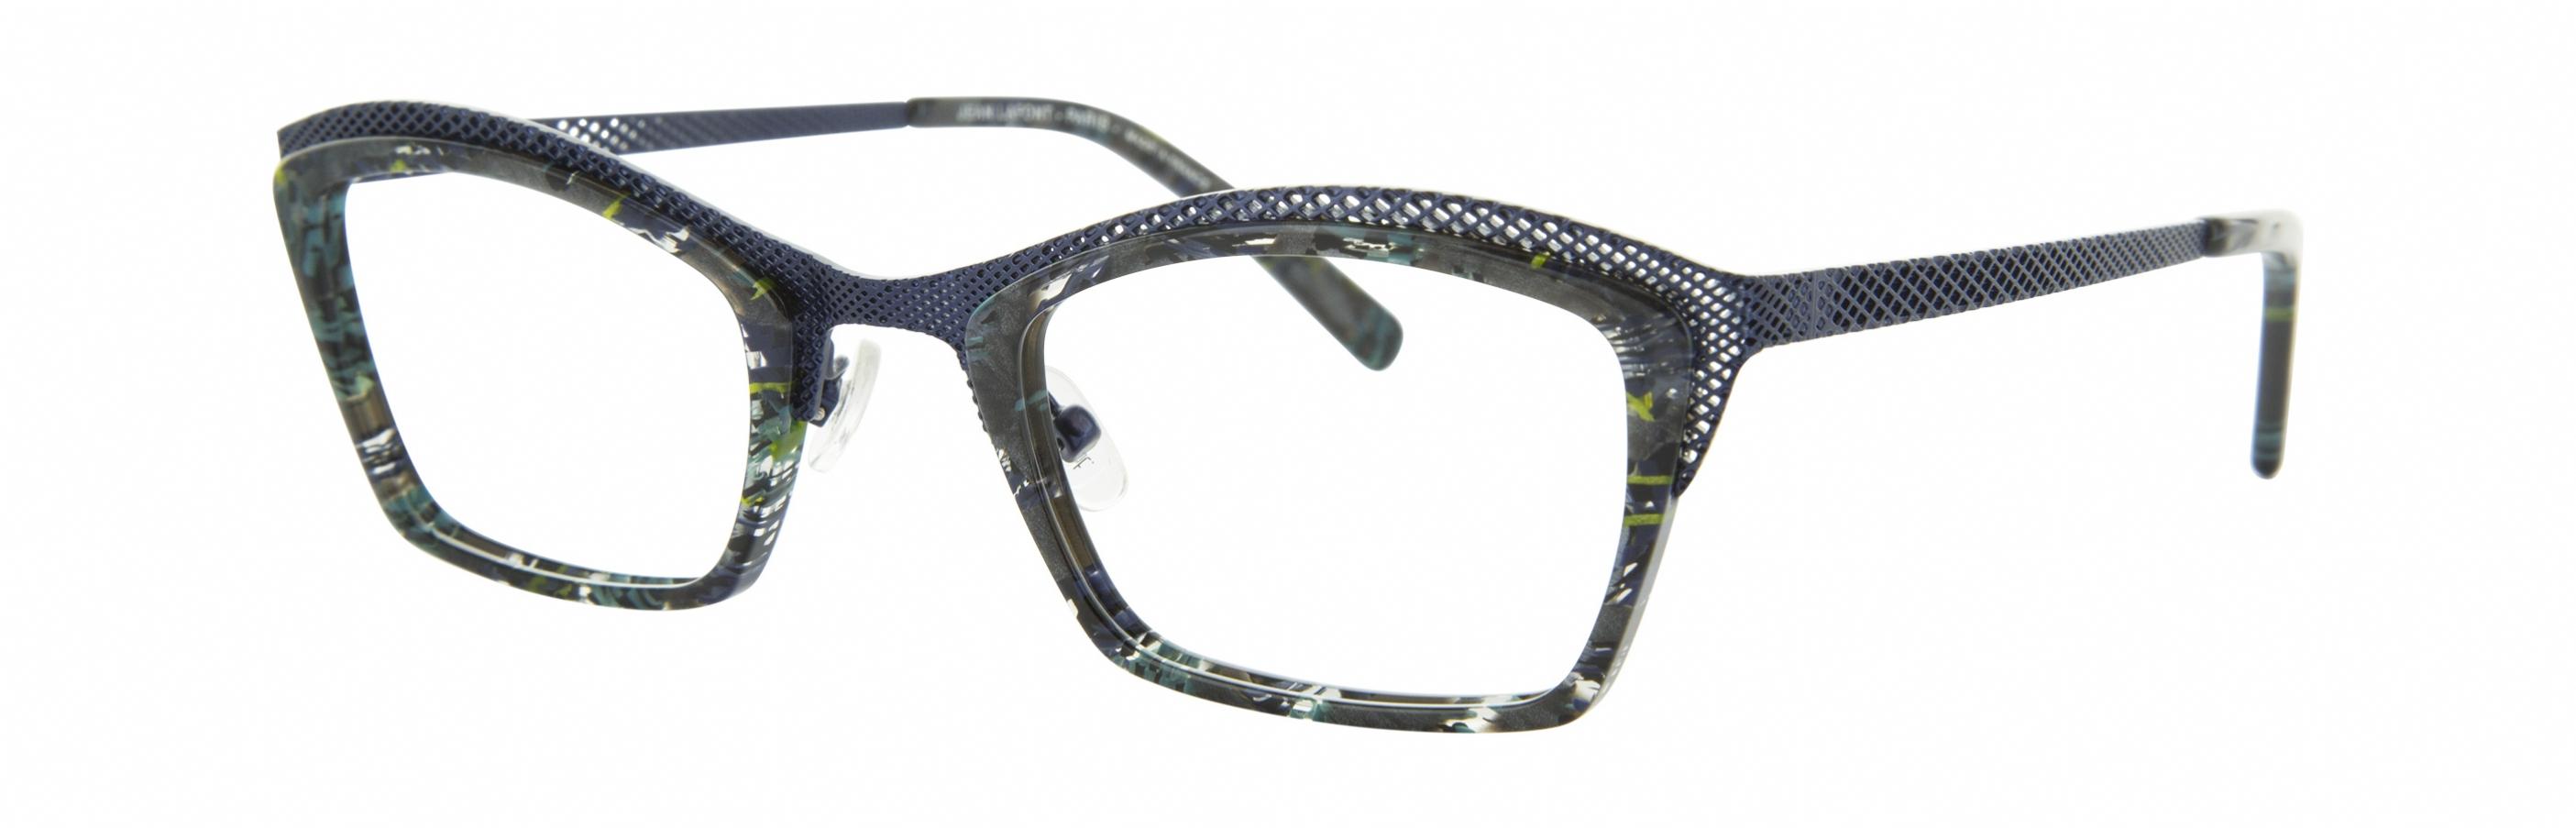 671a536f98b Lafont Variation Eyeglasses